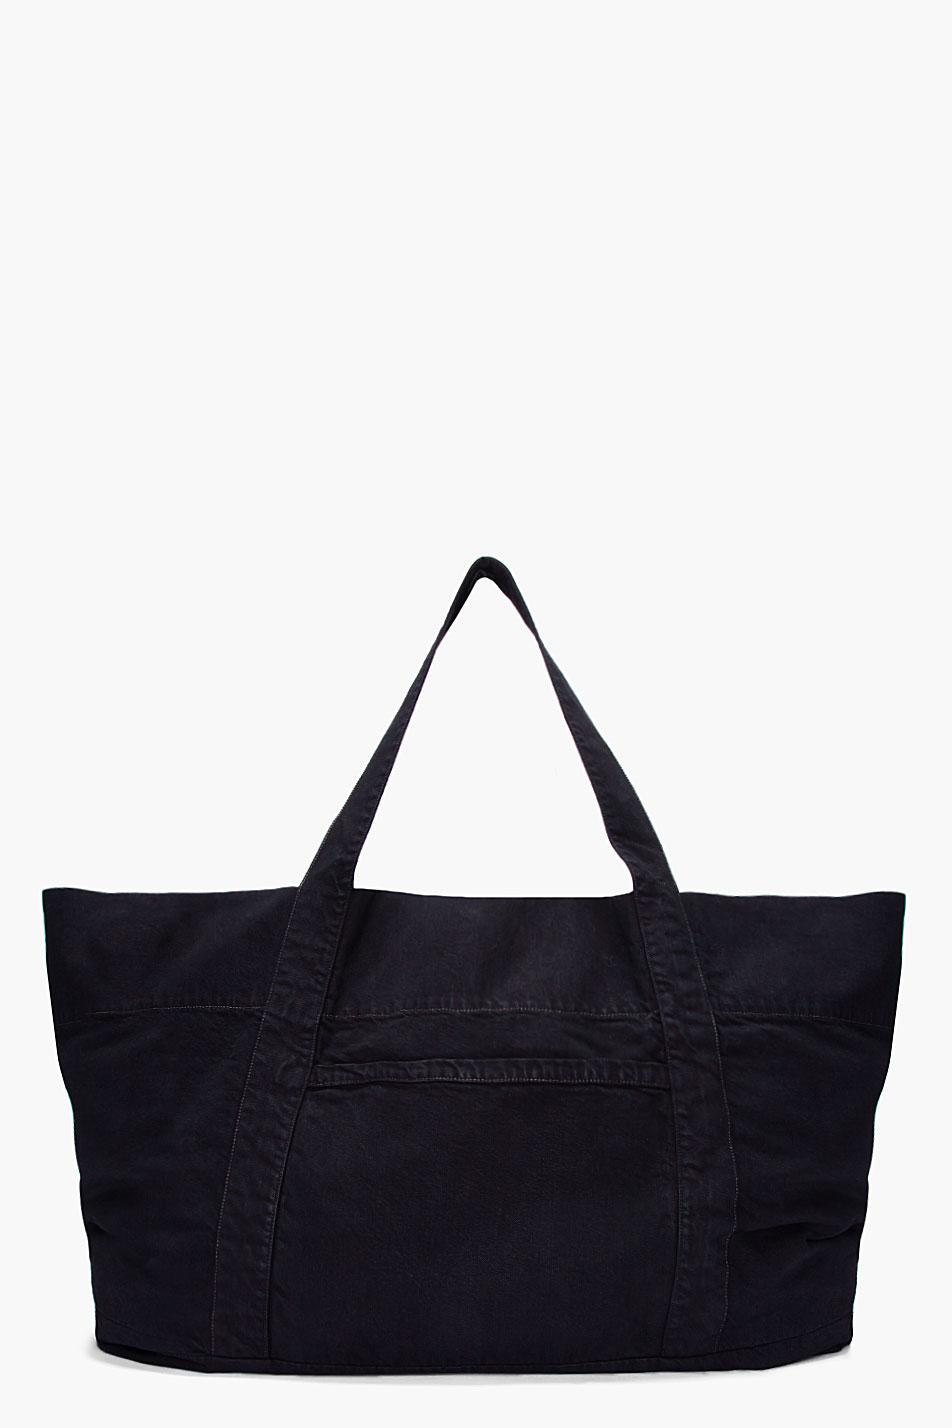 Drkshdw by rick owens Oversize Black Denim Beach Bag in Black for ...